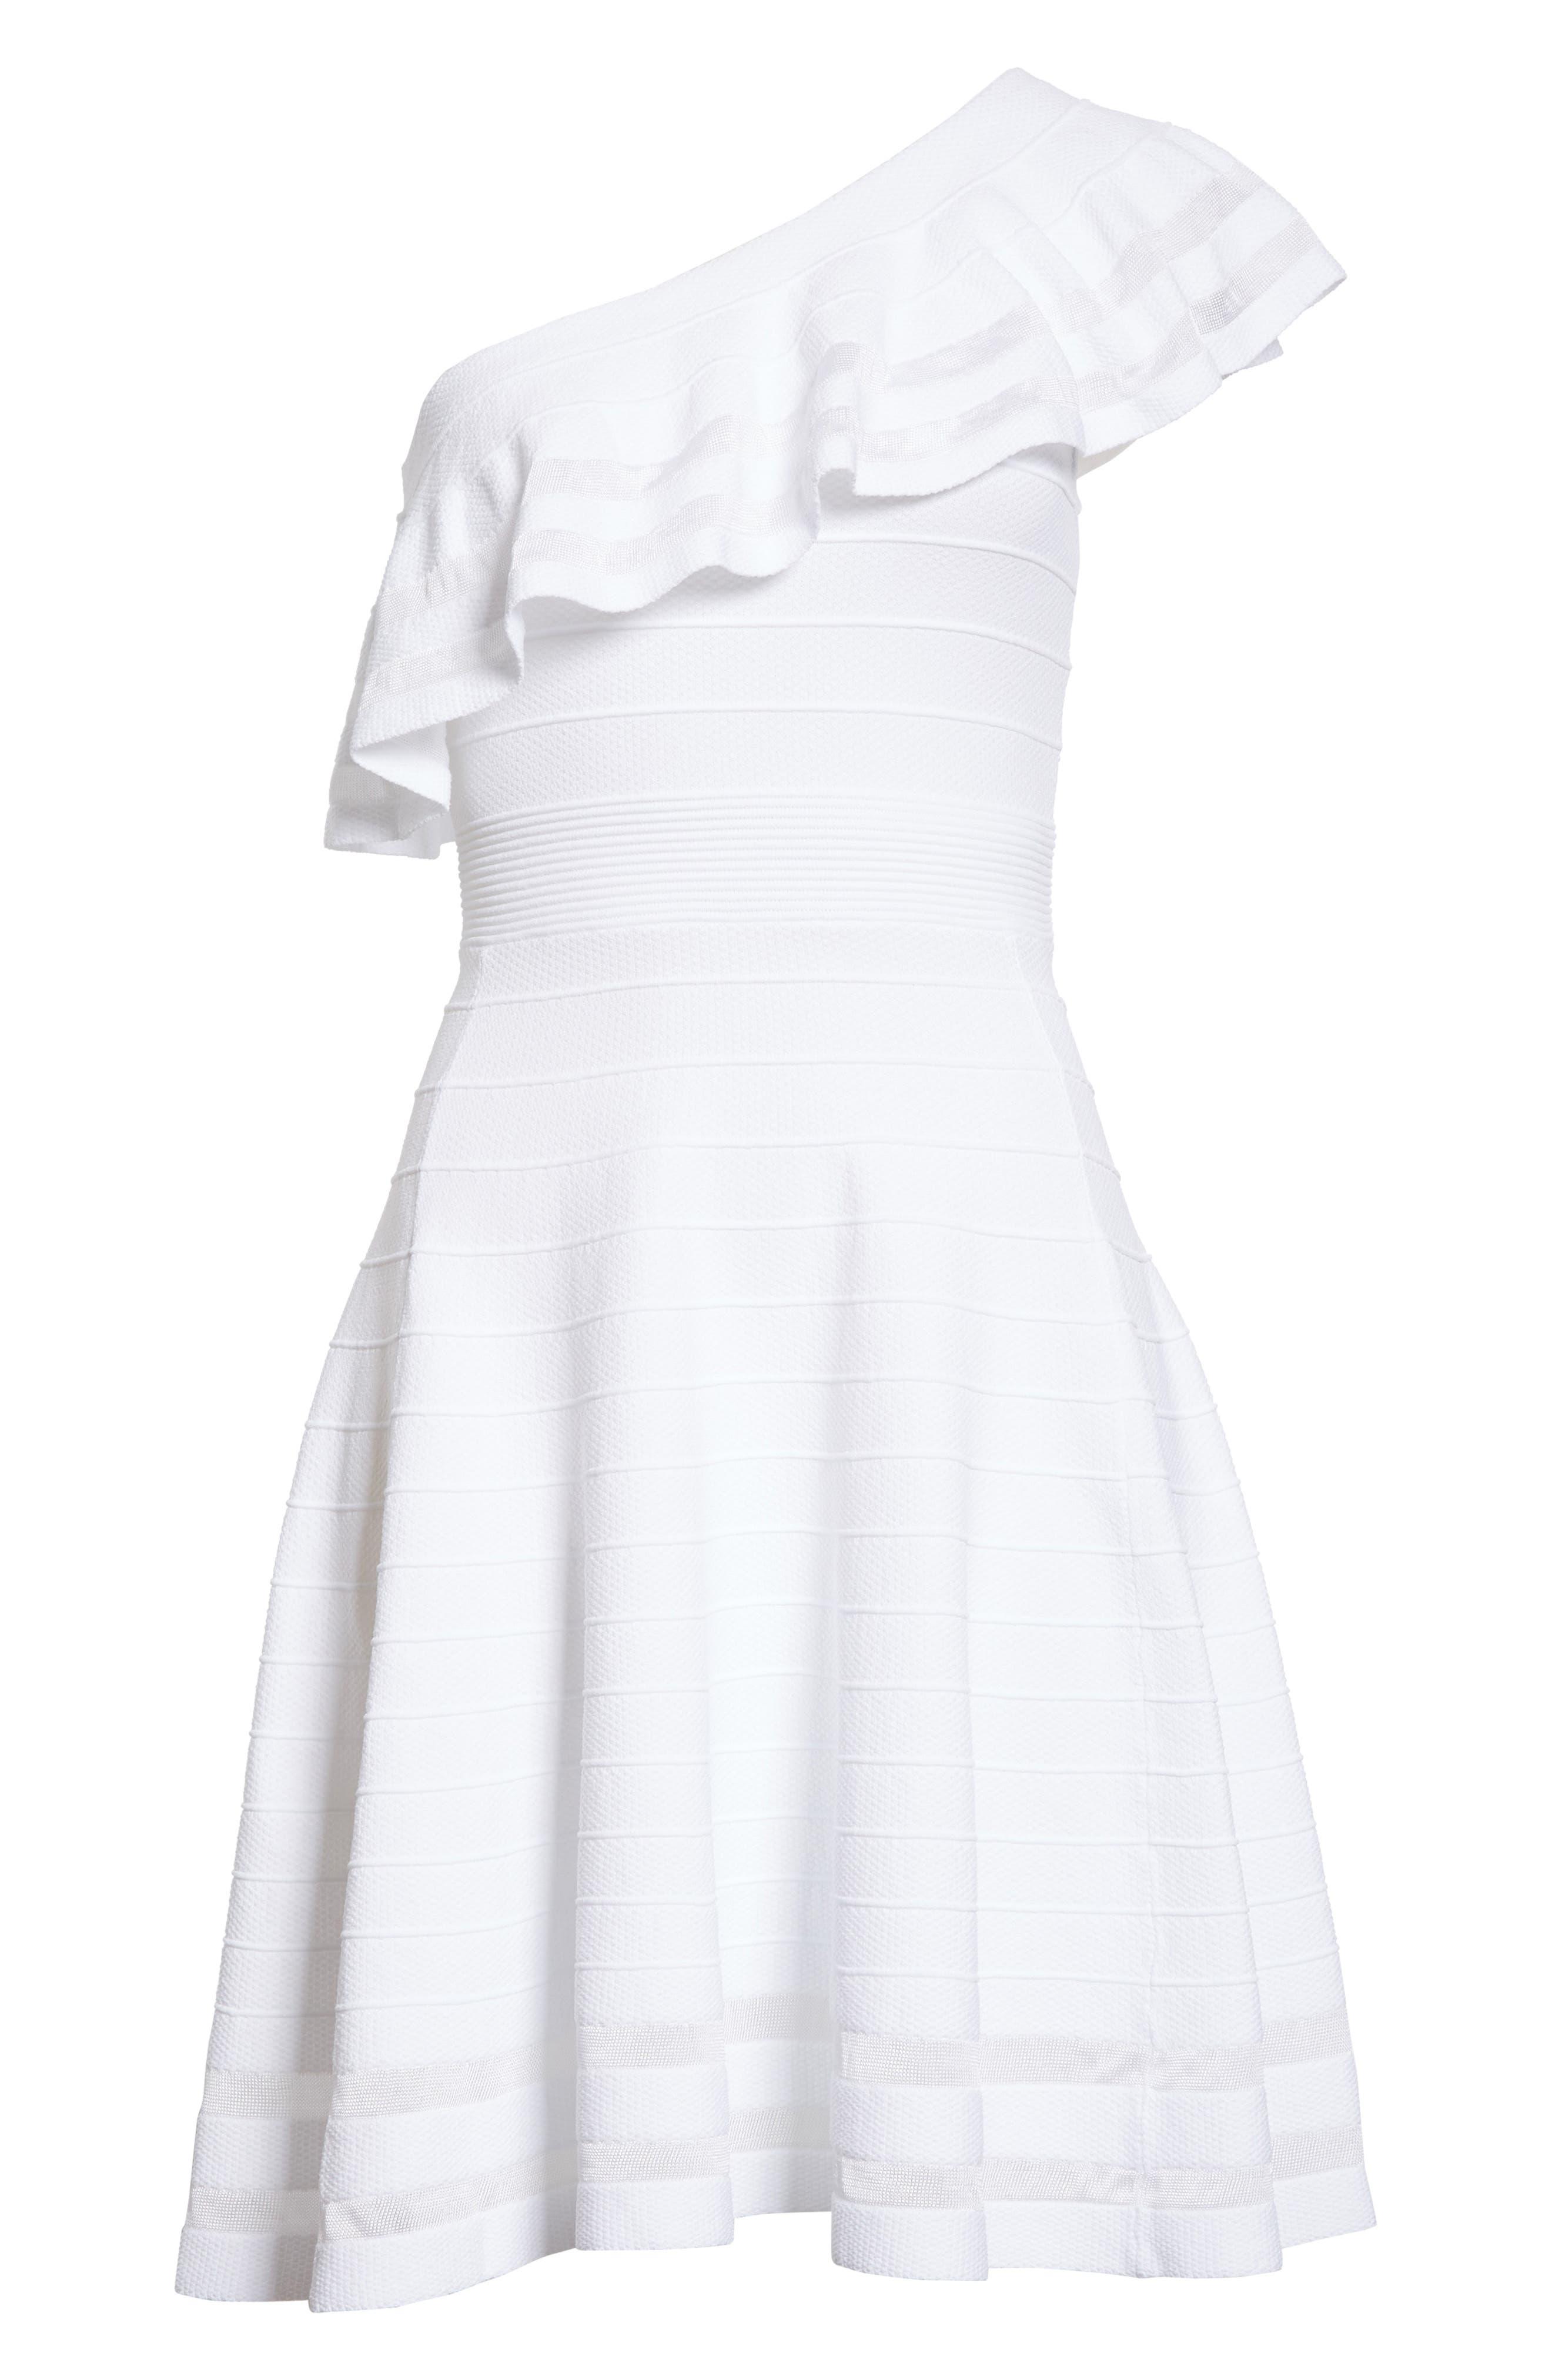 Streena Knit Skater Dress,                             Alternate thumbnail 6, color,                             110